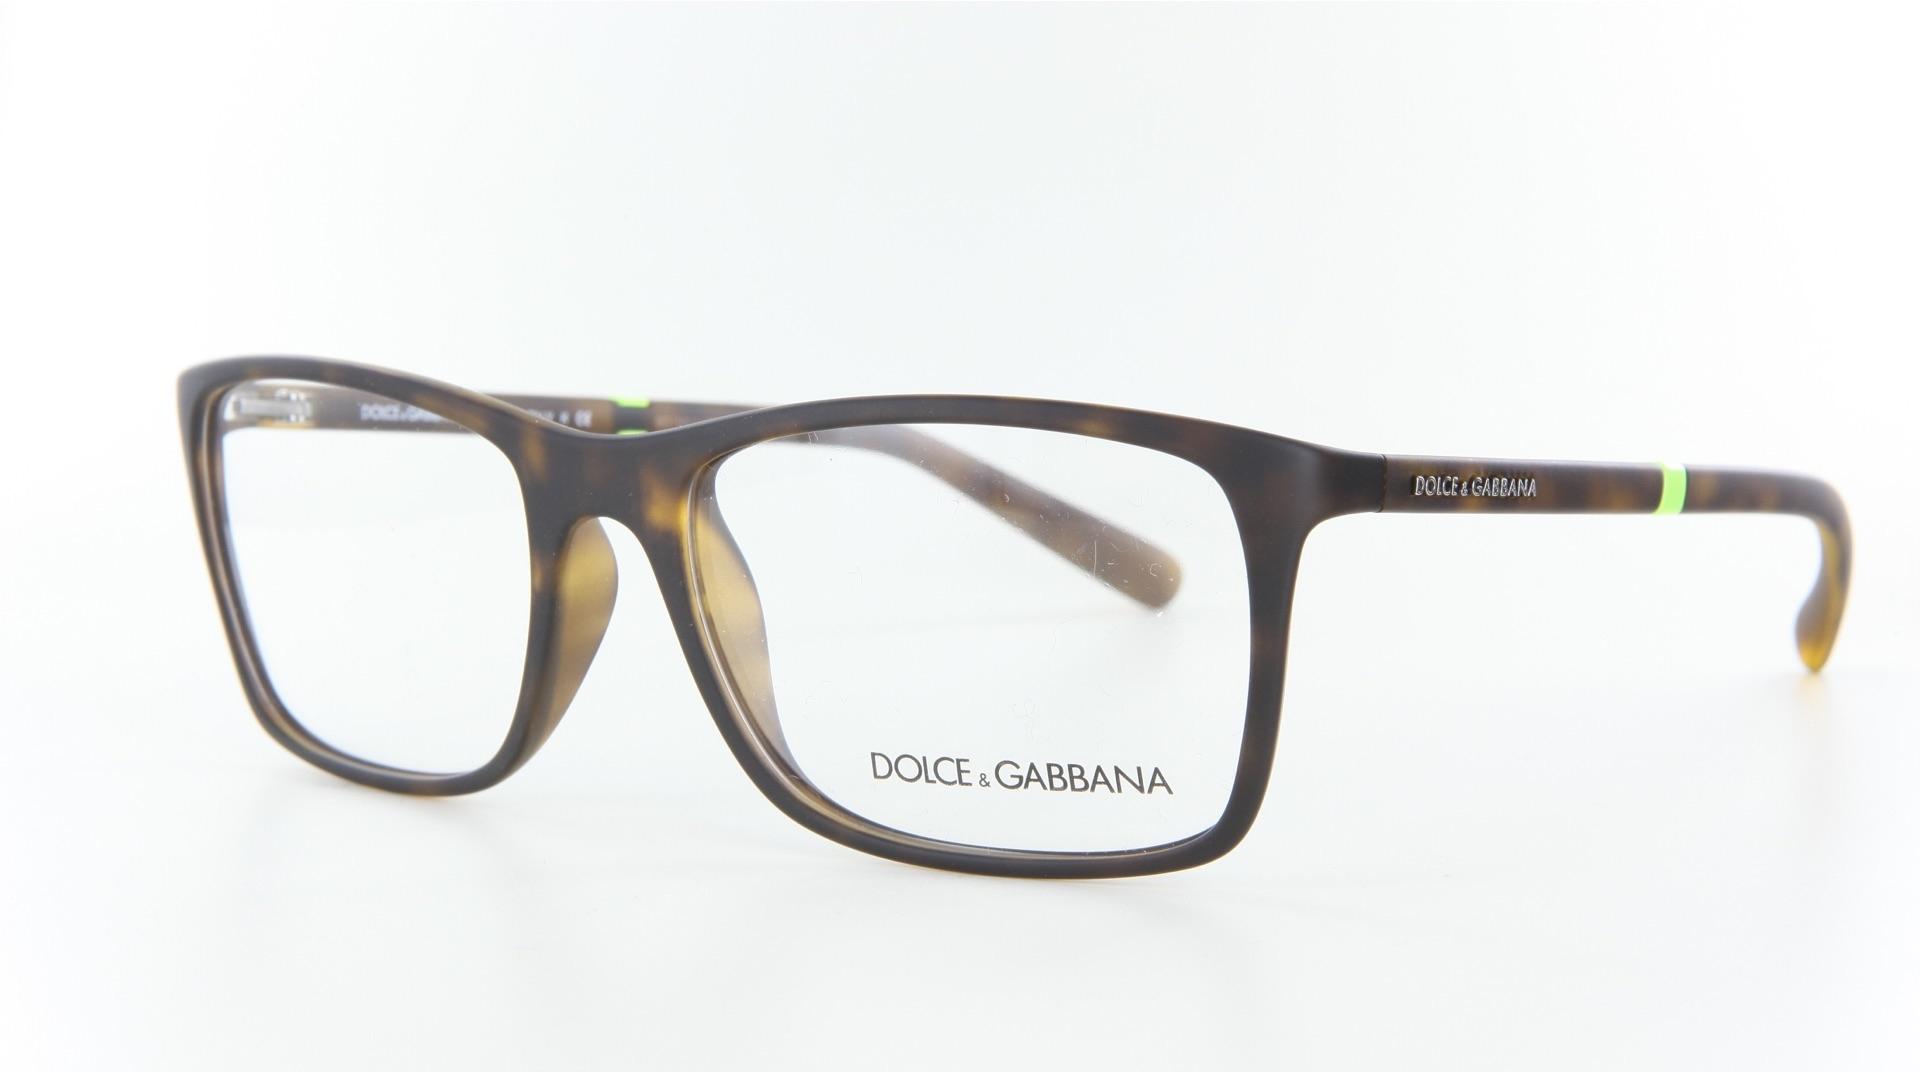 Dolce & Gabbana - ref: 74374